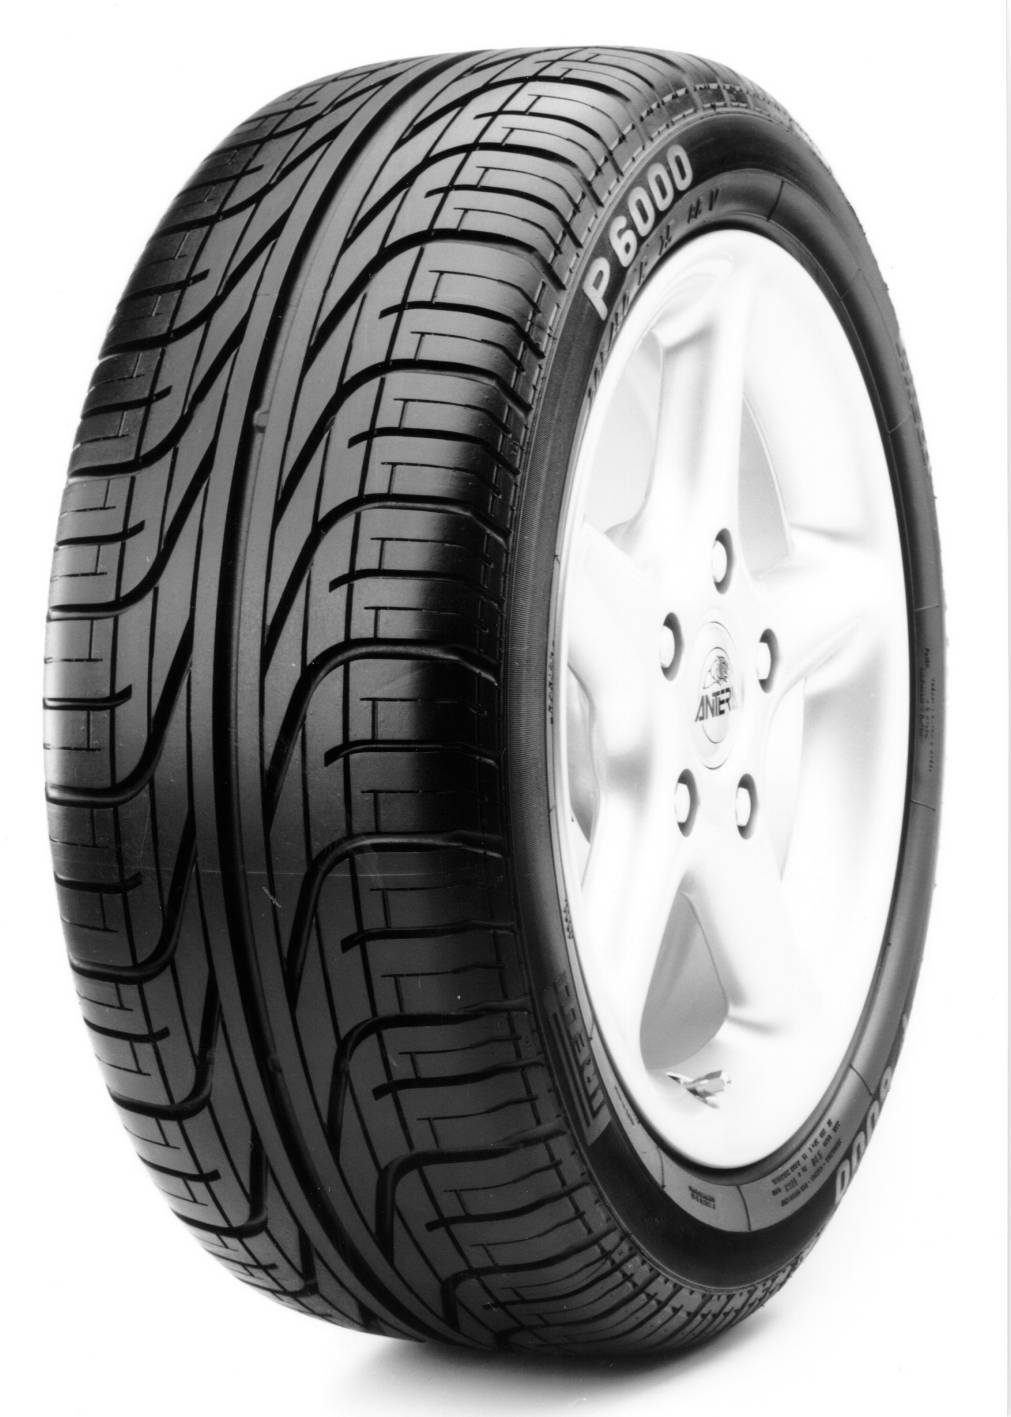 Neumático PIRELLI P6000 POWERGY 235/50R17 96 Y